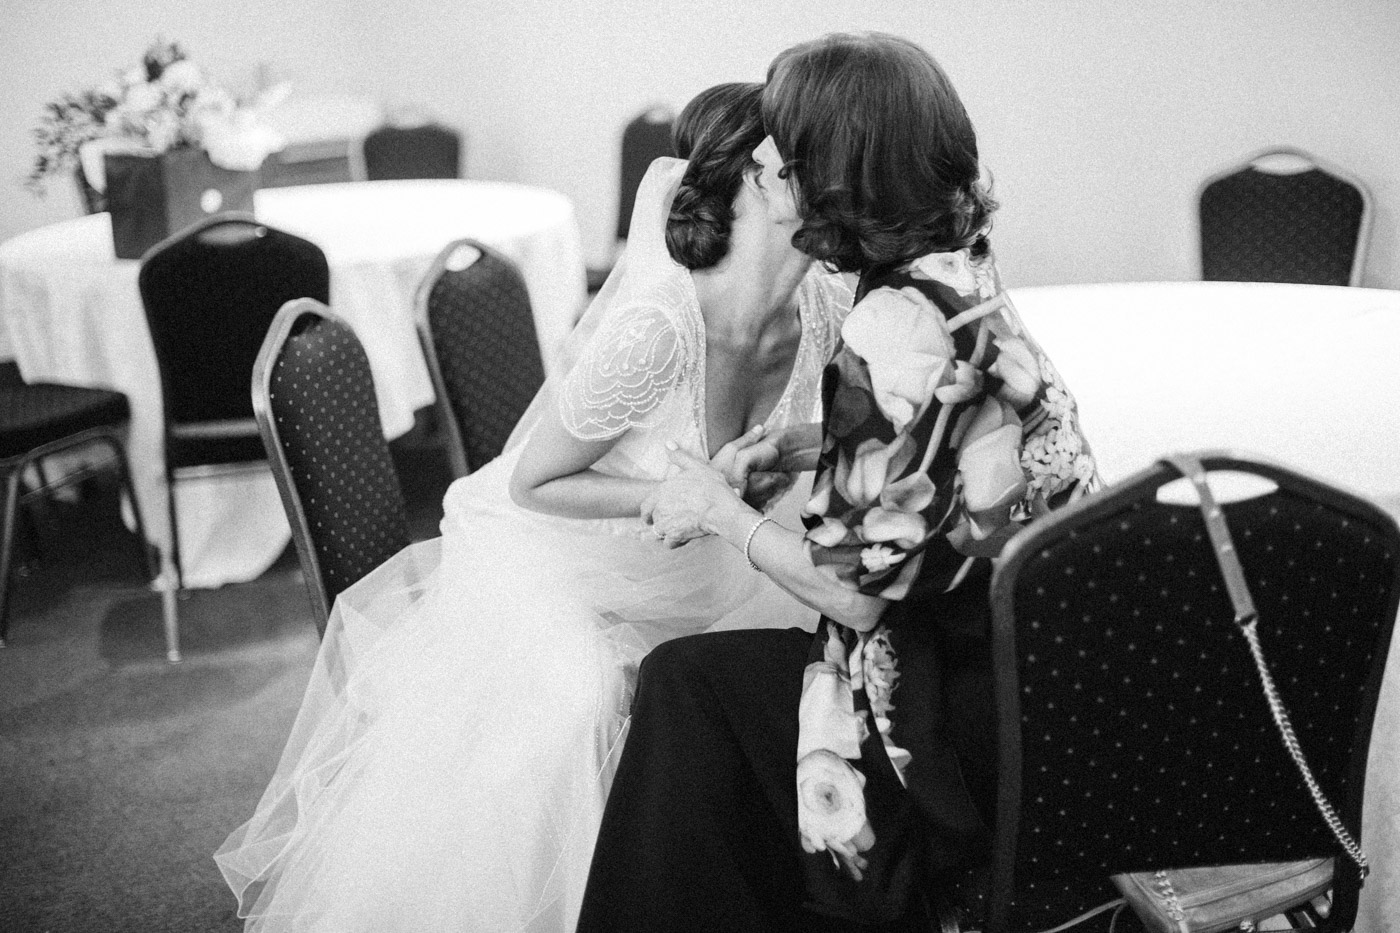 toronto_wedding_photographer_the_great_hall-54.jpg